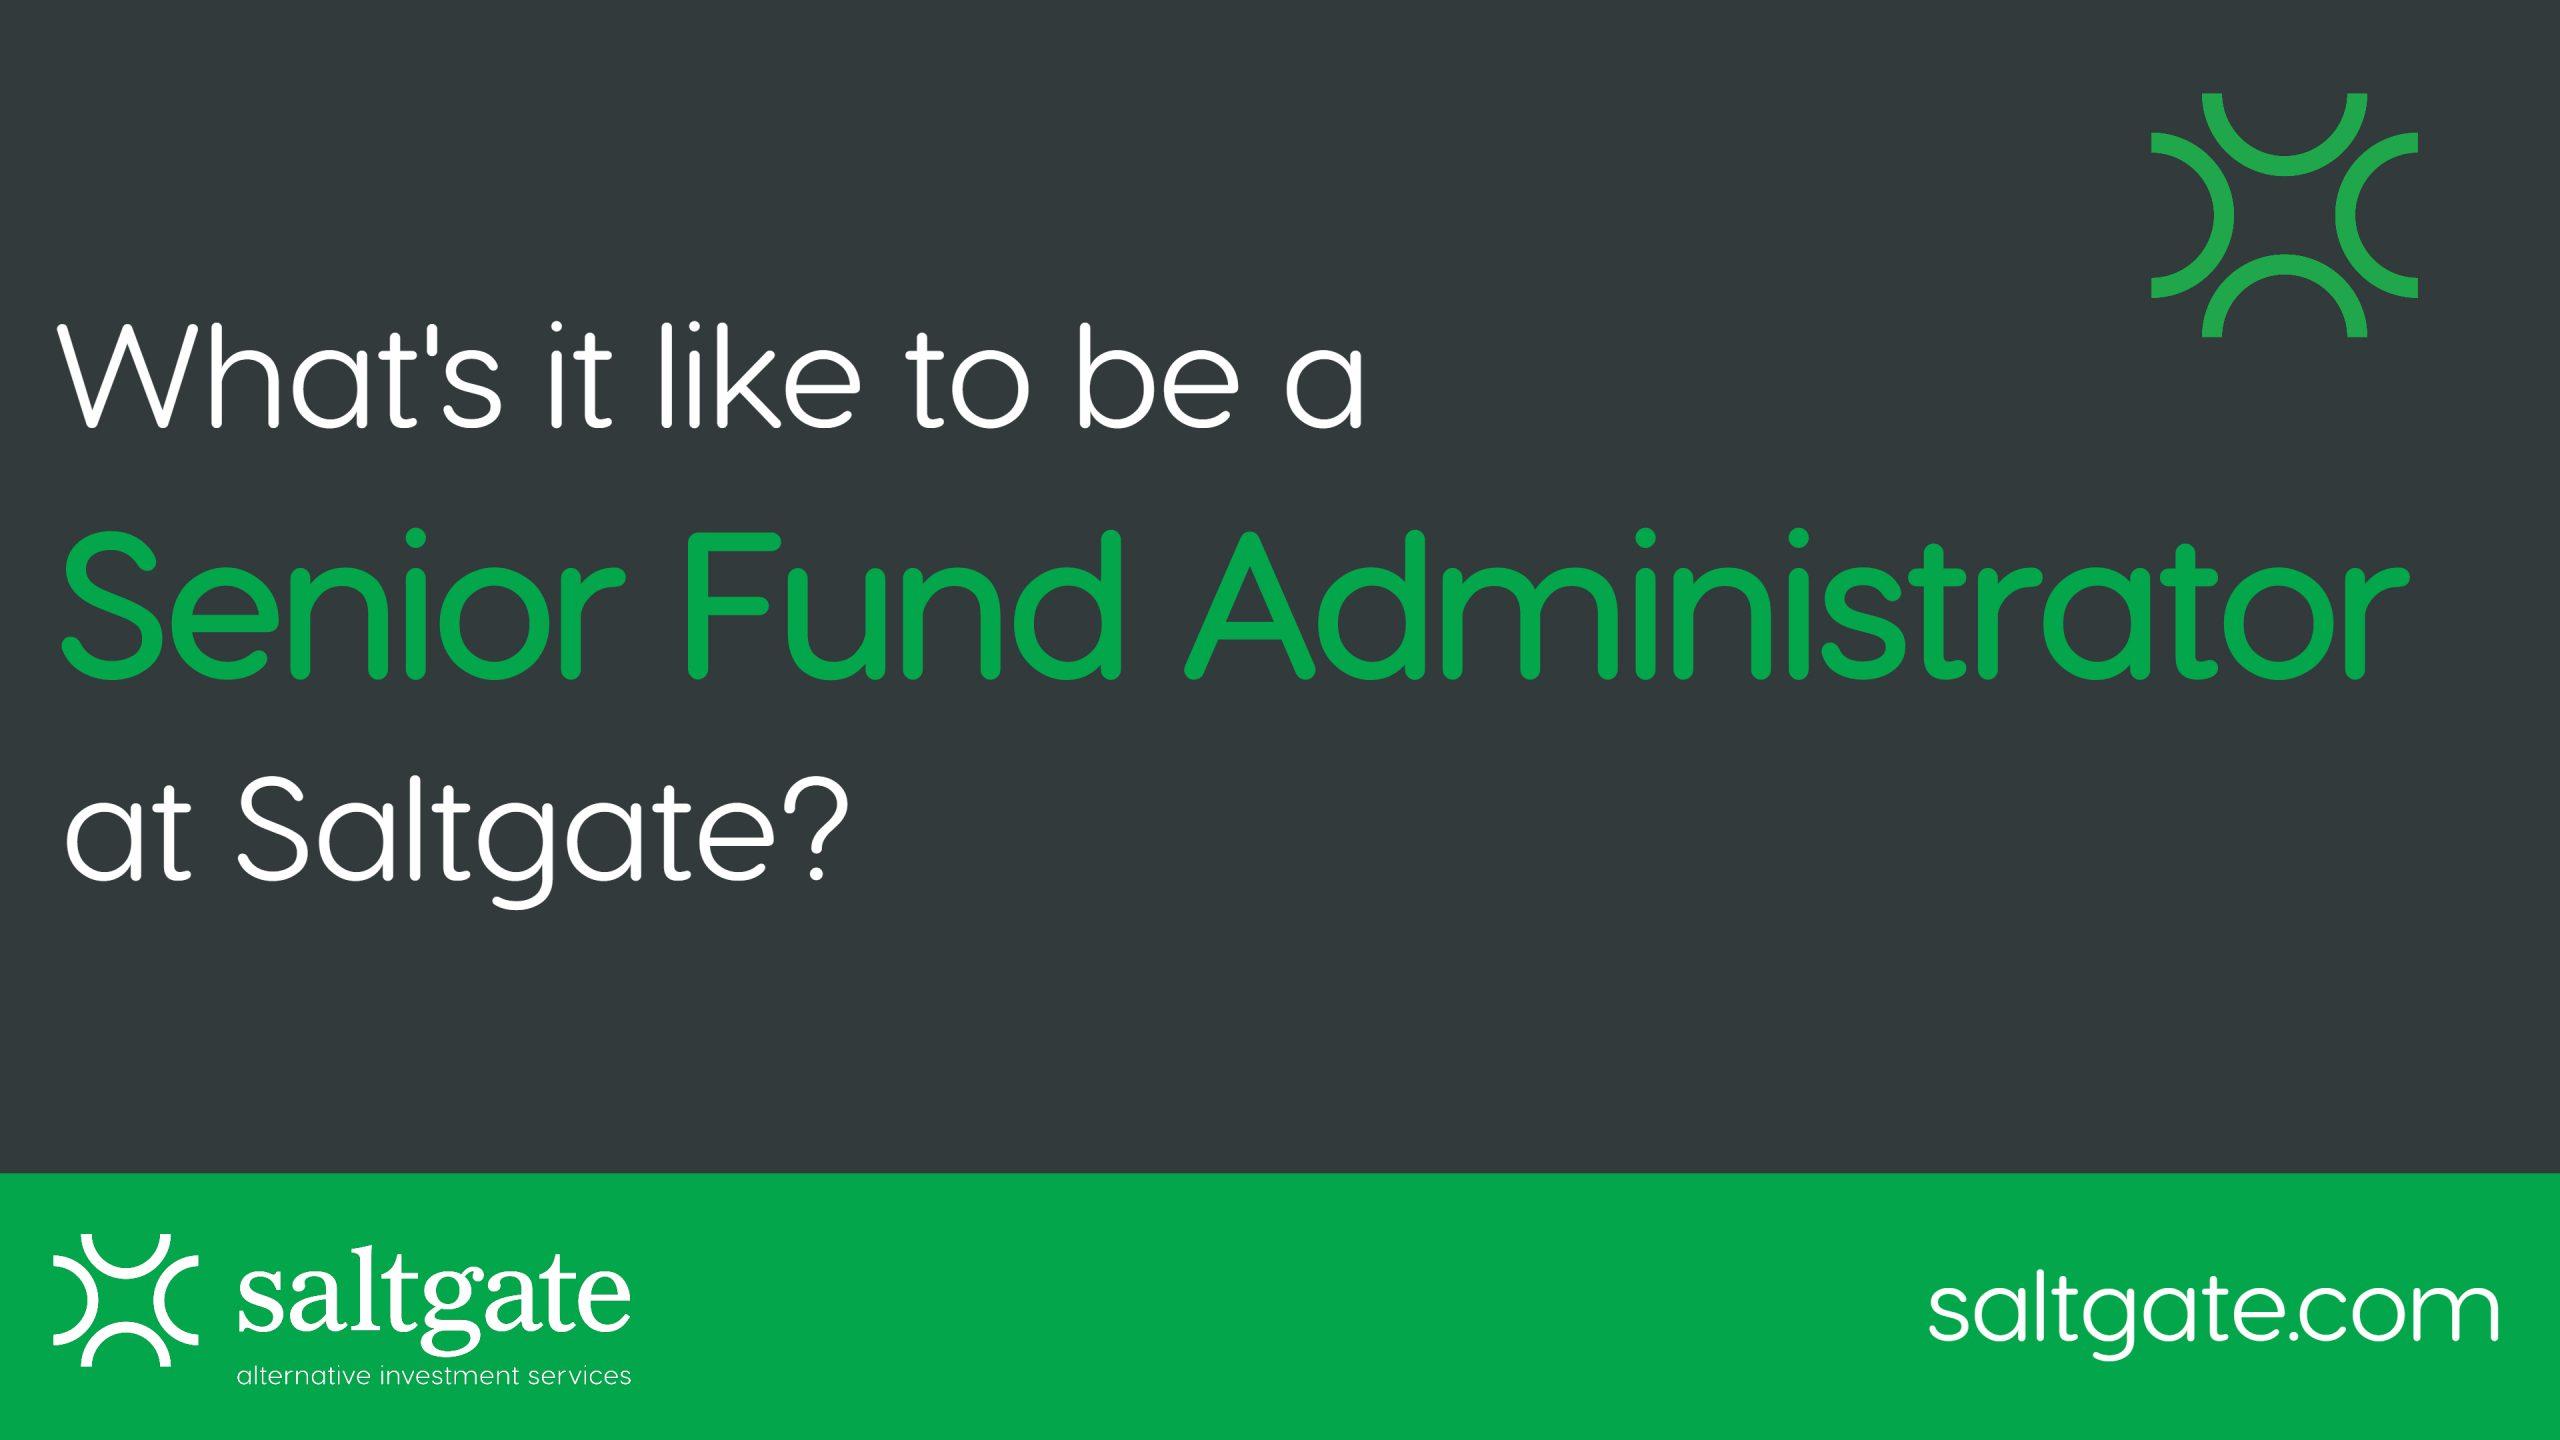 Senior Fund Administrator at Saltgate